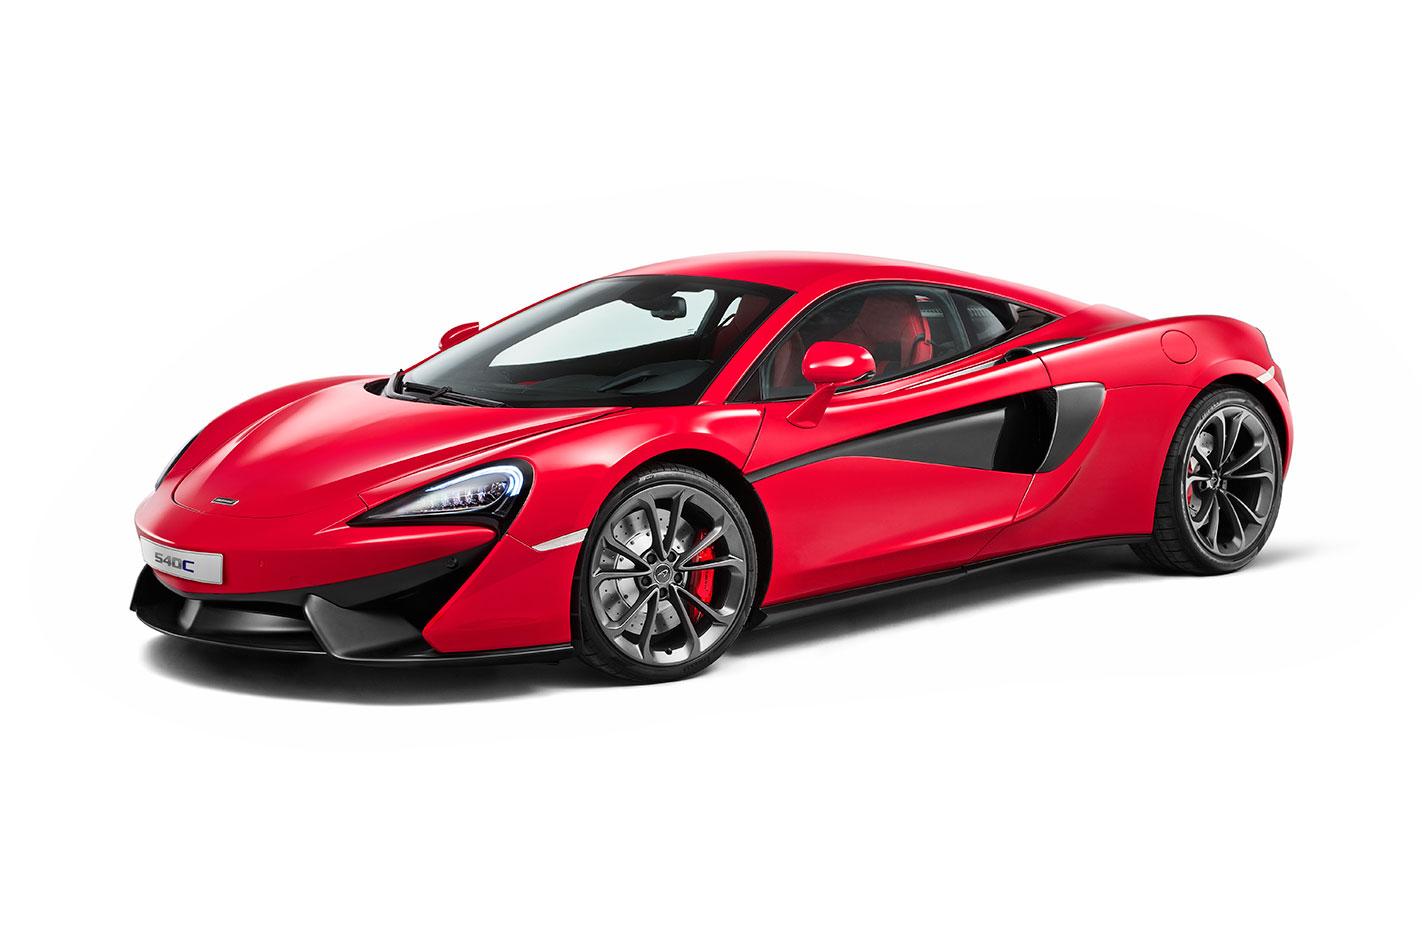 2015 McLaren 540C